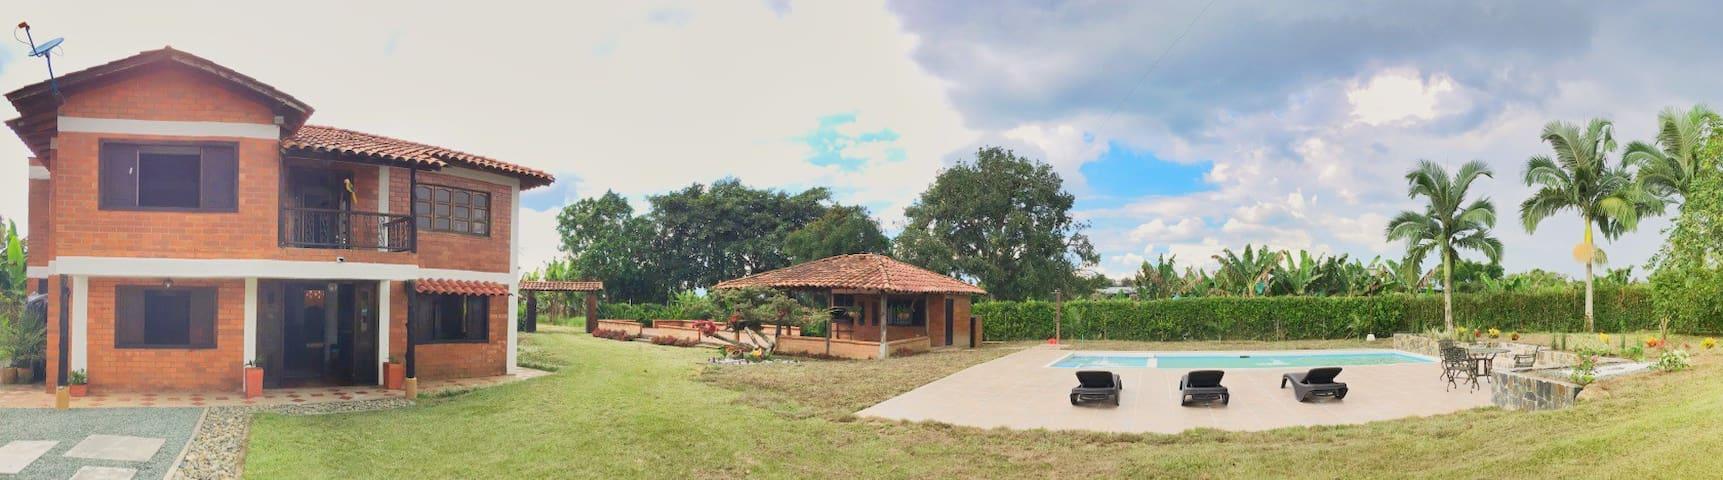 Tierra Labrantia Finca Campestre - Quimbaya - Pondok alam